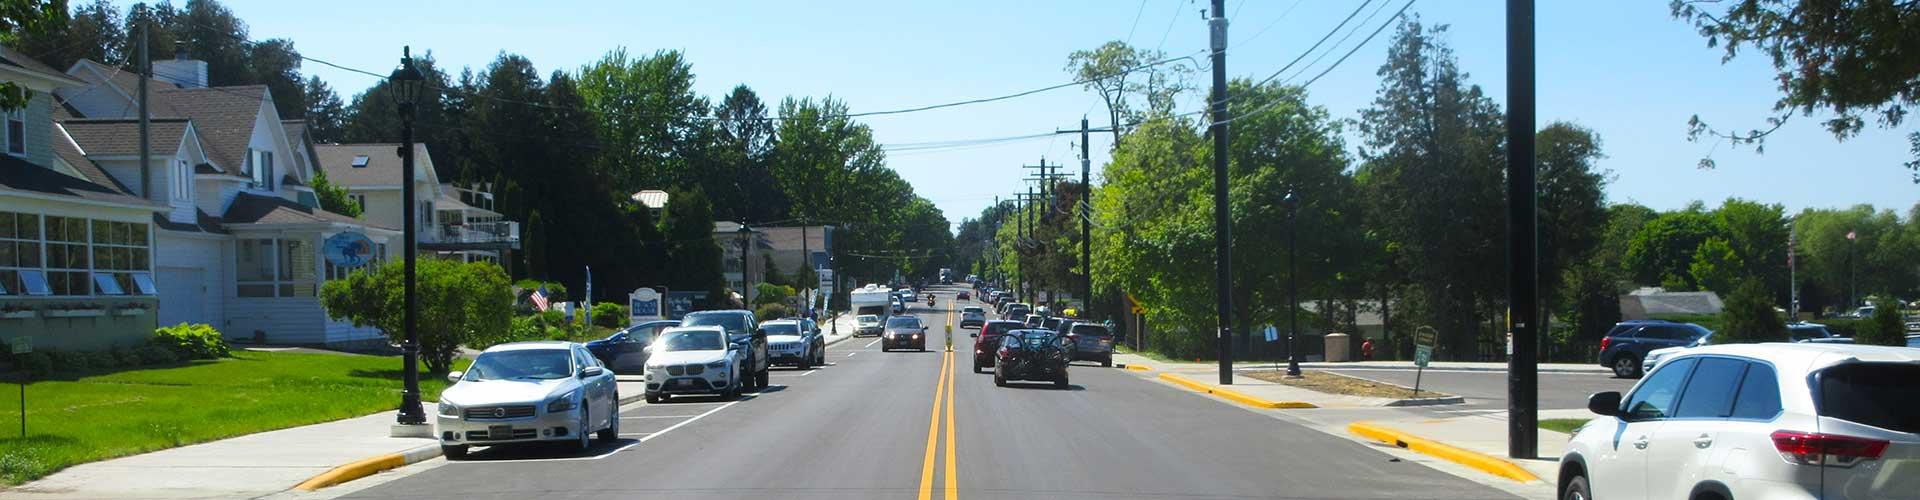 WIS 42 as rural main street in northern Wisconsin